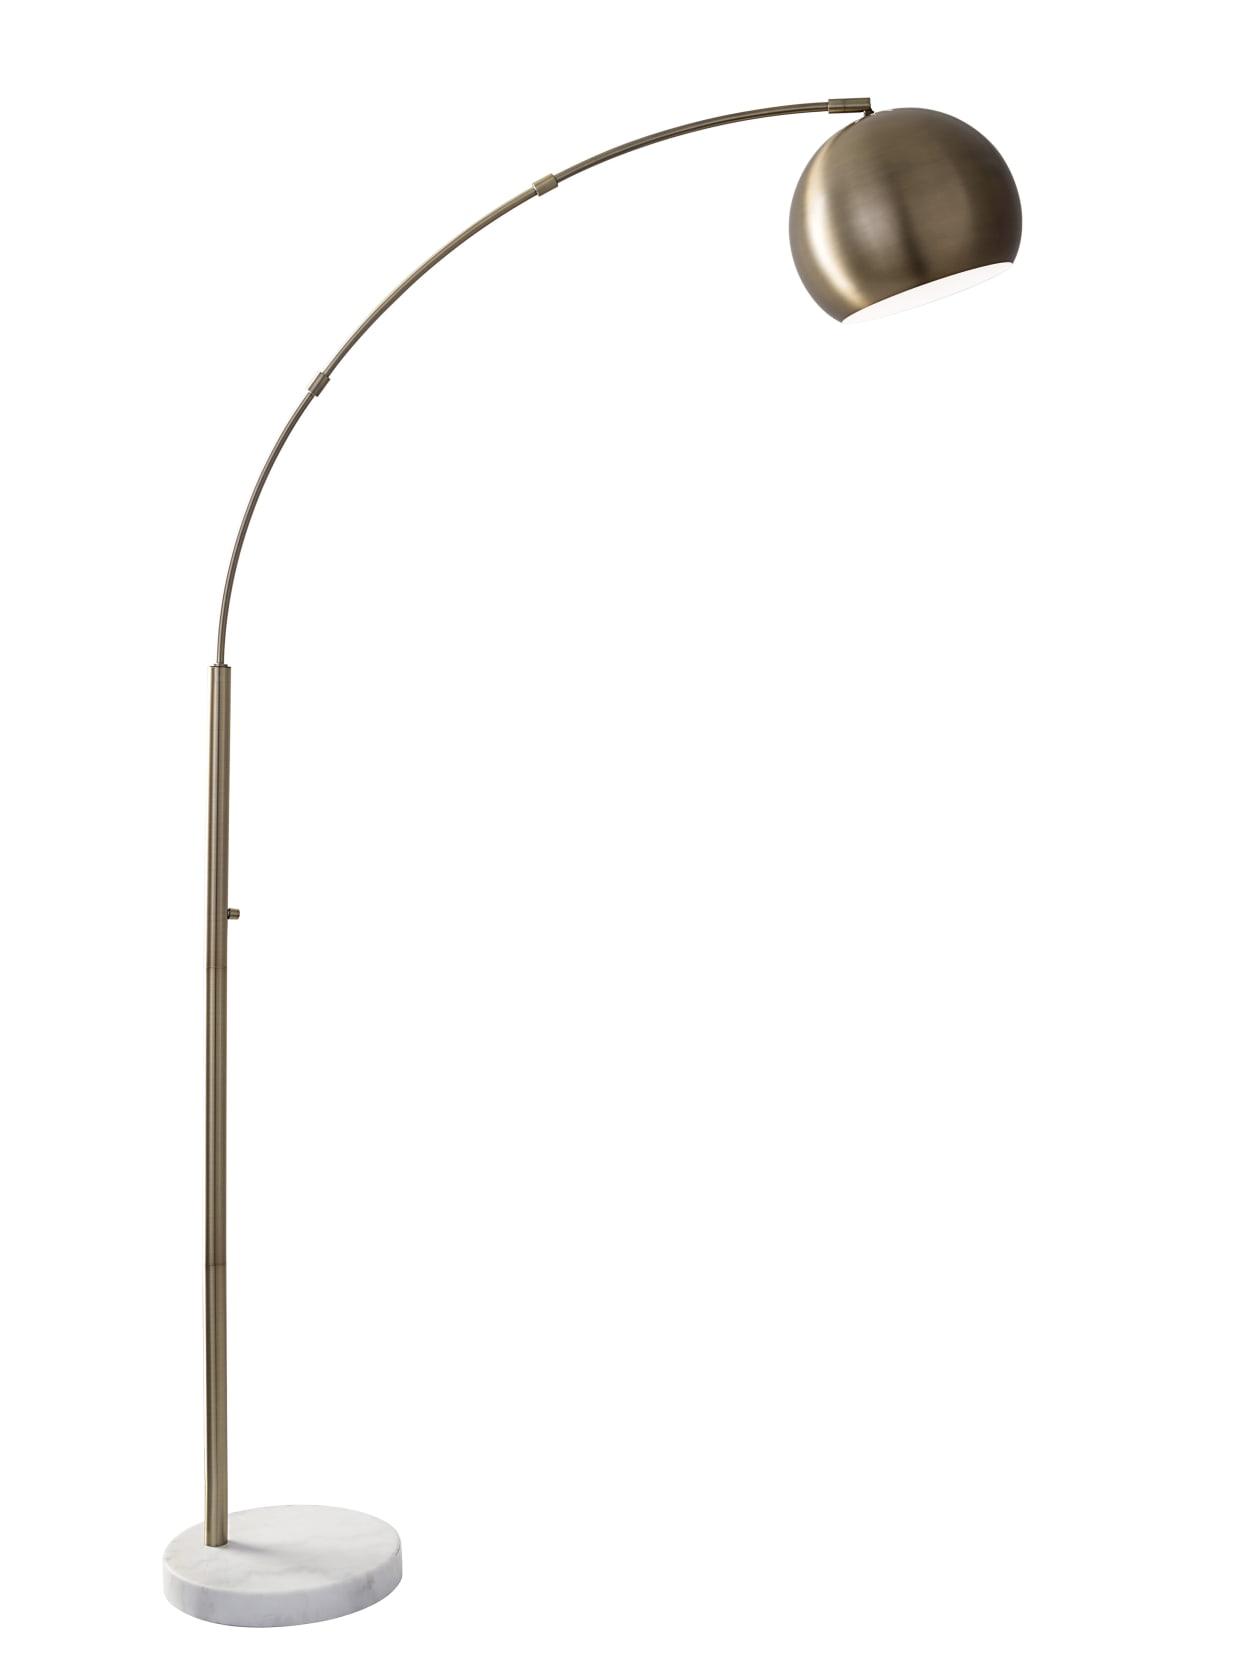 Adesso Astoria Arc Floor Lamp 78 H Antique Brass Shadewhite Marble Base Office Depot